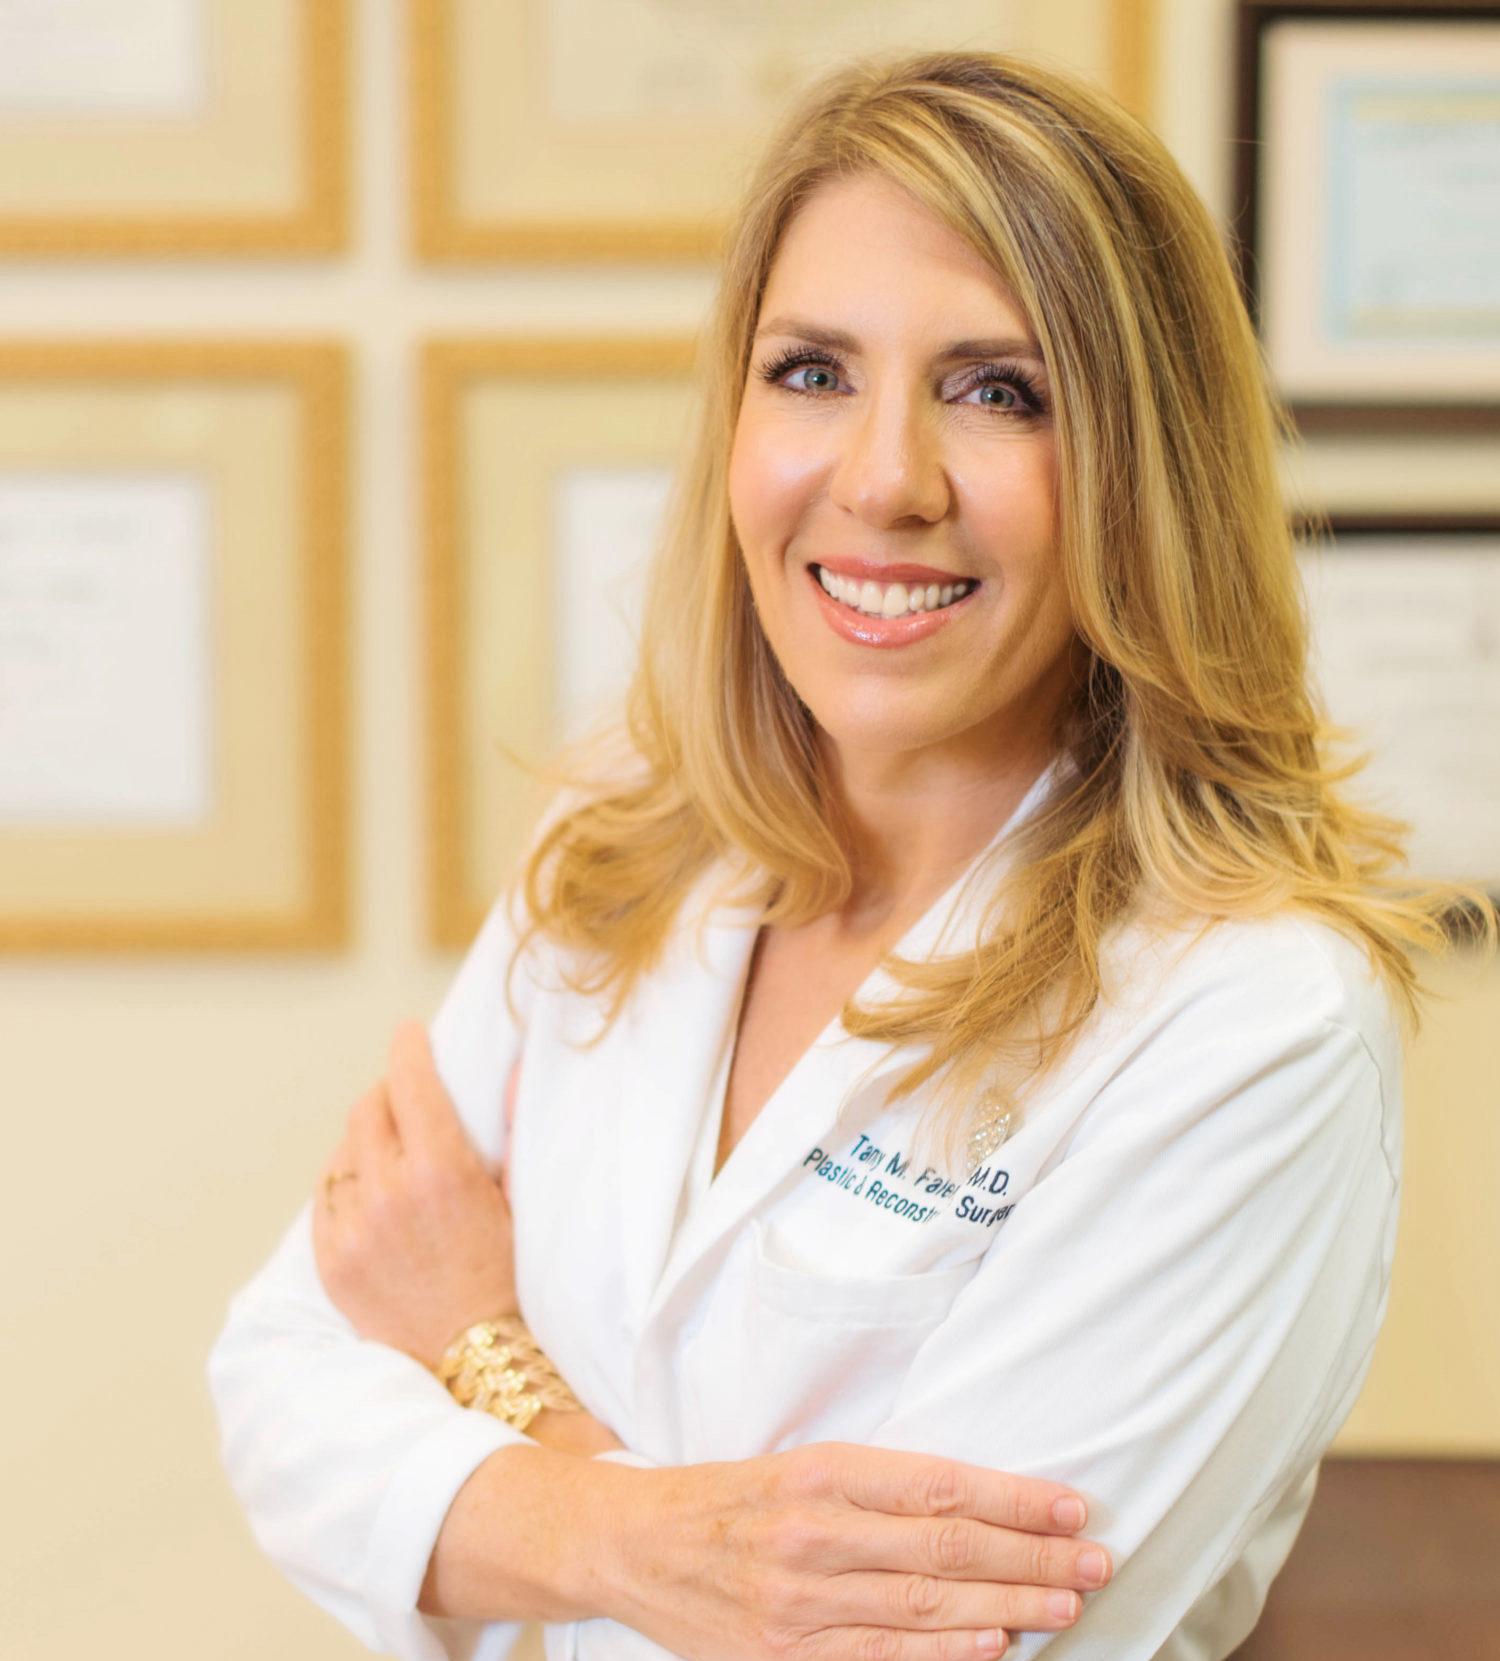 Dr. Tamy M. Faierman